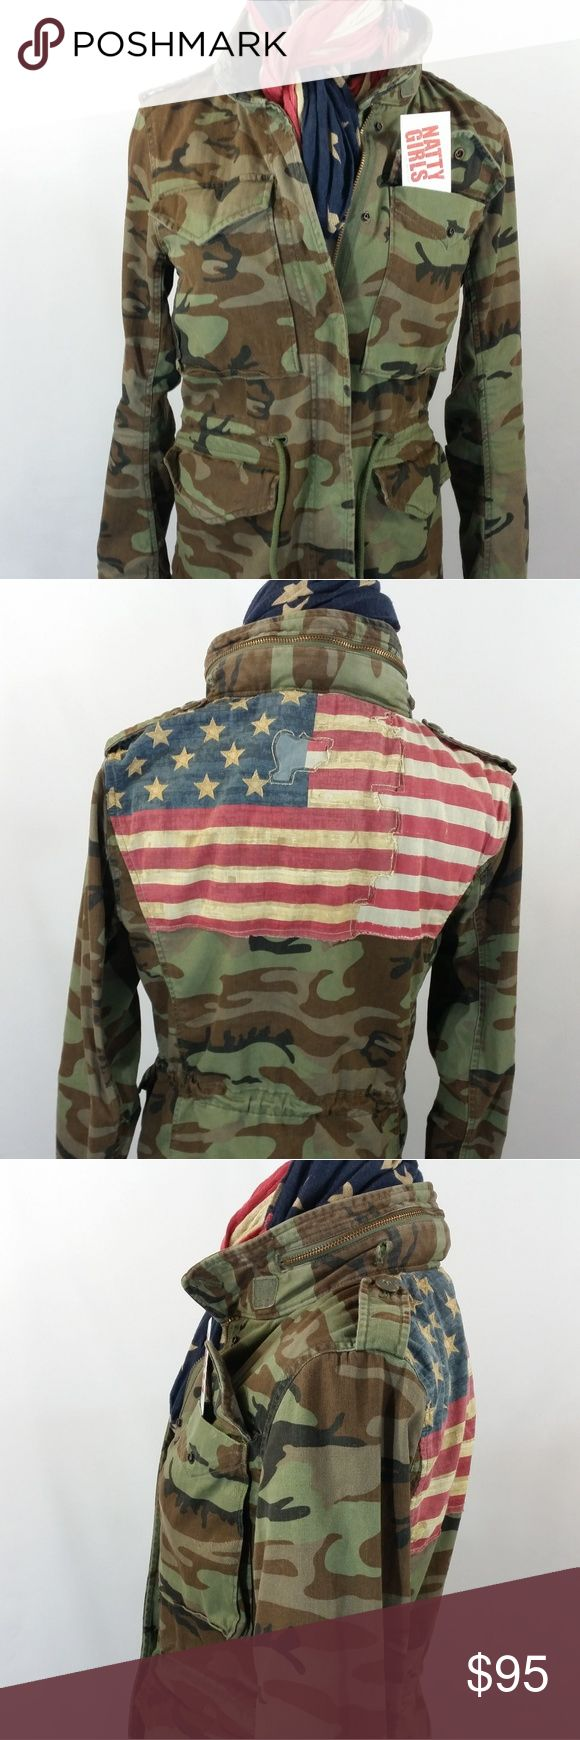 Ralph Lauren Supply & Denim (Polo) Jacket Camouflage Jacket w/American Flag on back Ralph Lauren Jackets & Coats